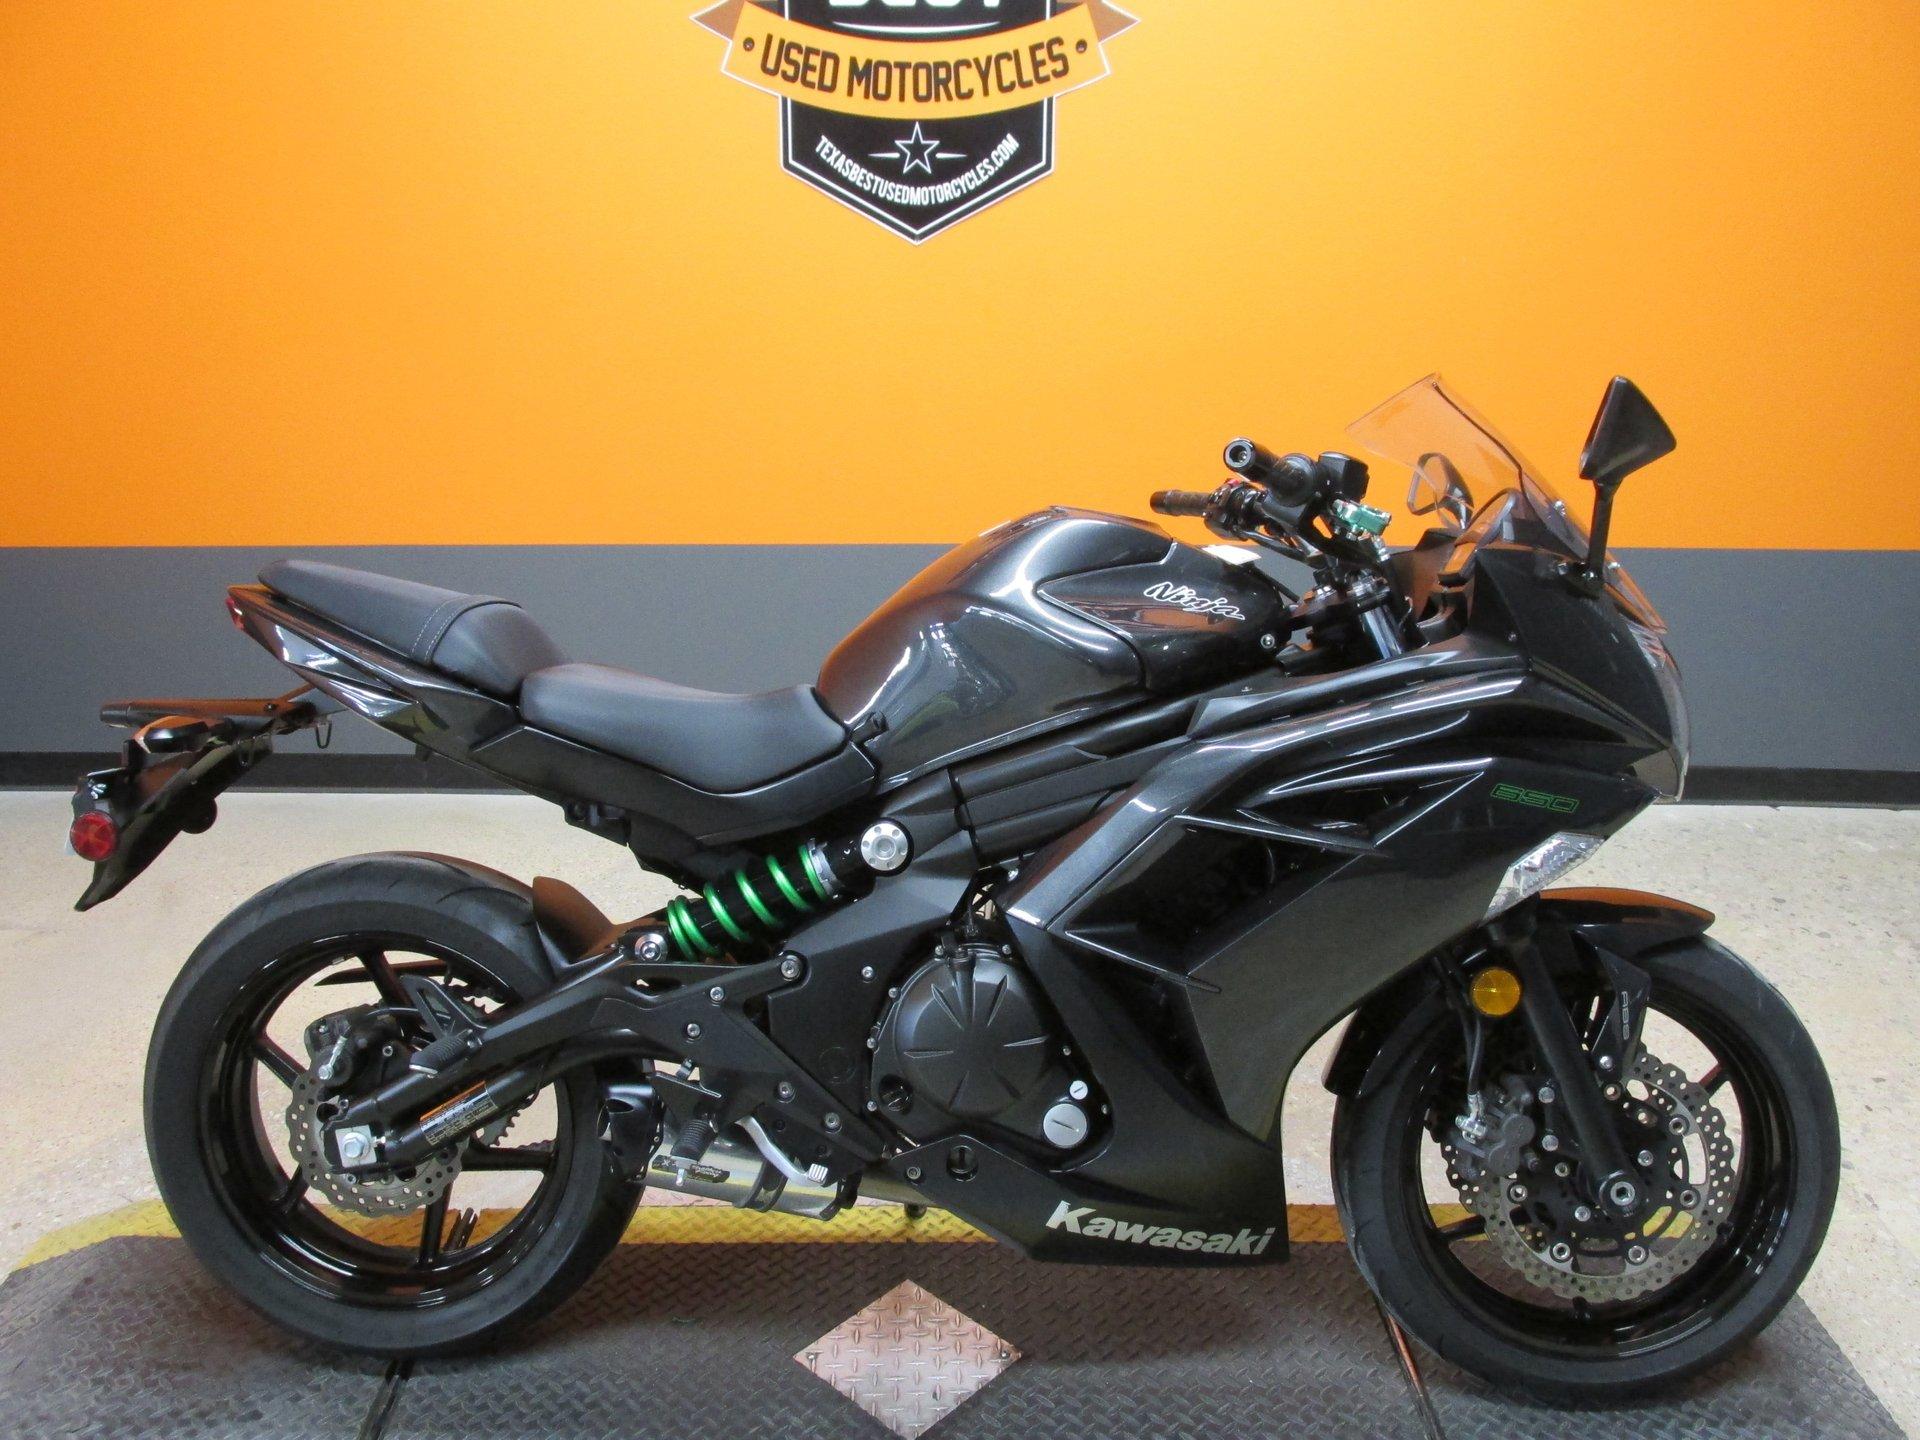 2016 kawasaki ninja 650 ex650f